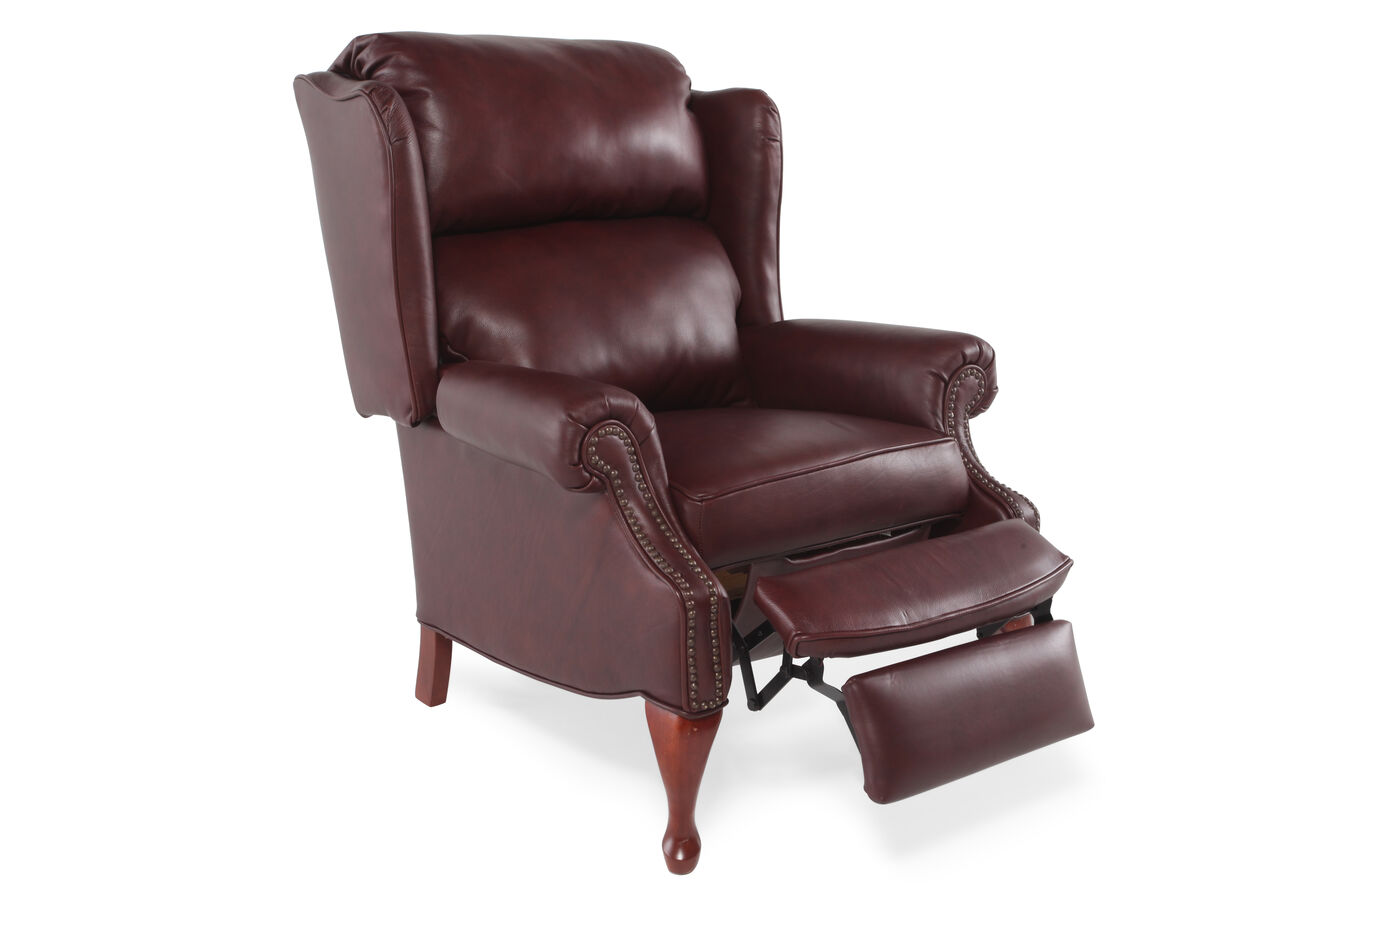 Lane Savannah Leather Recliner | Mathis Brothers Furniture